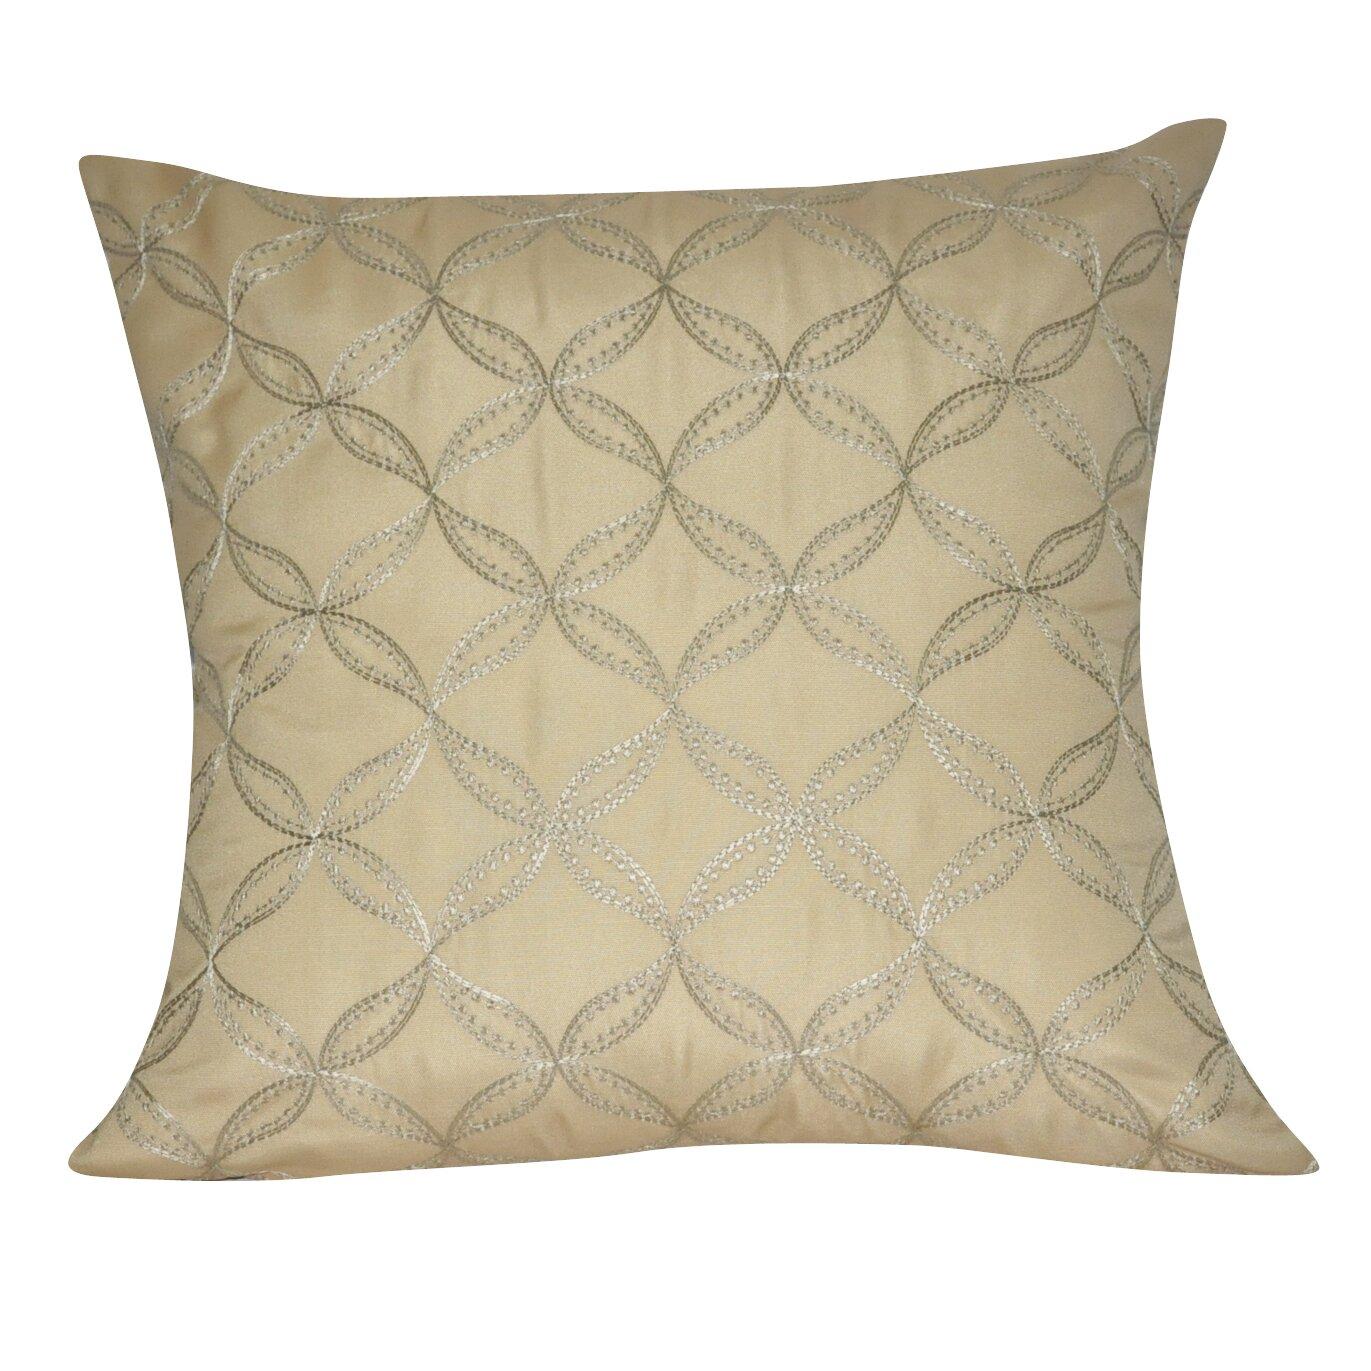 Wayfair Decorative Throw Pillows : Loom and Mill Circles Decorative Throw Pillow & Reviews Wayfair